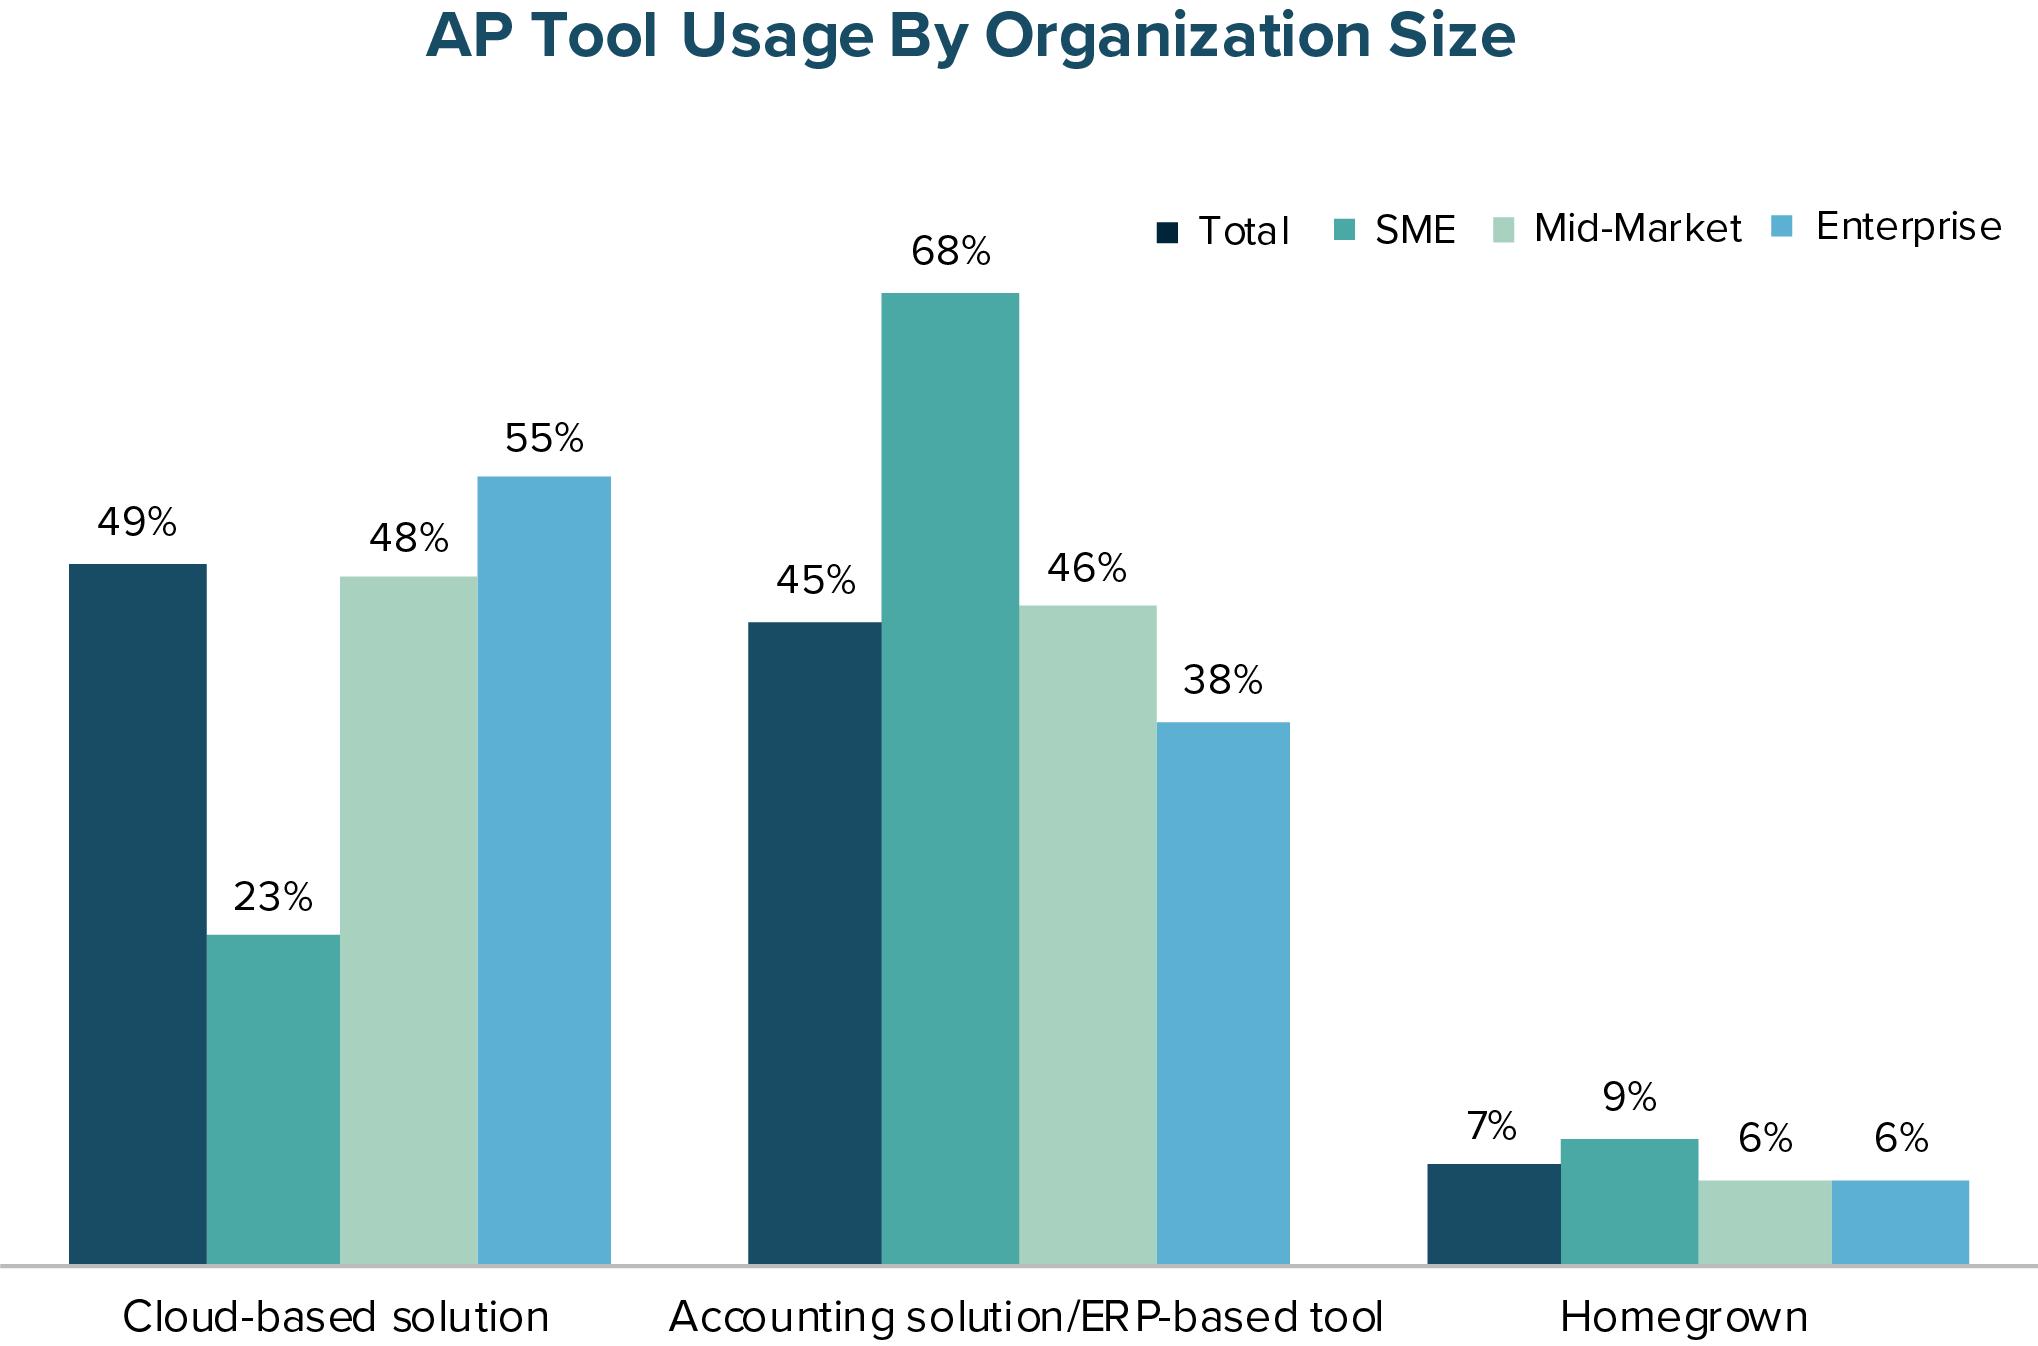 AP Tool Usage by Organization Size